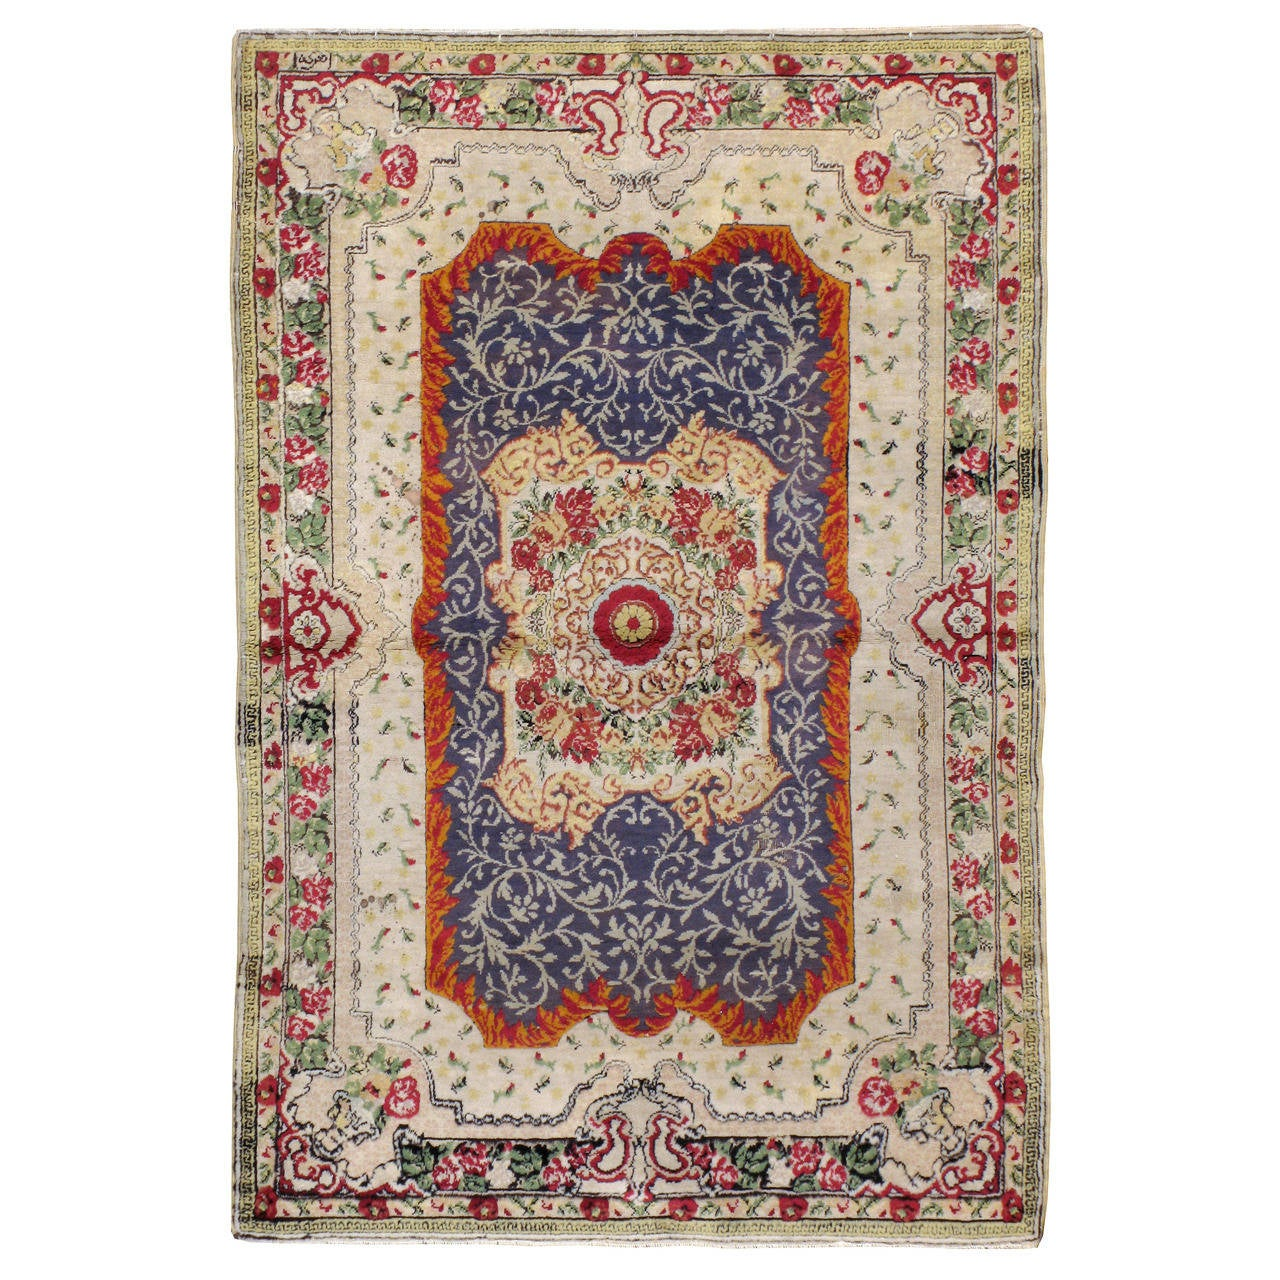 Antique Turkish Souf Hereke Rug